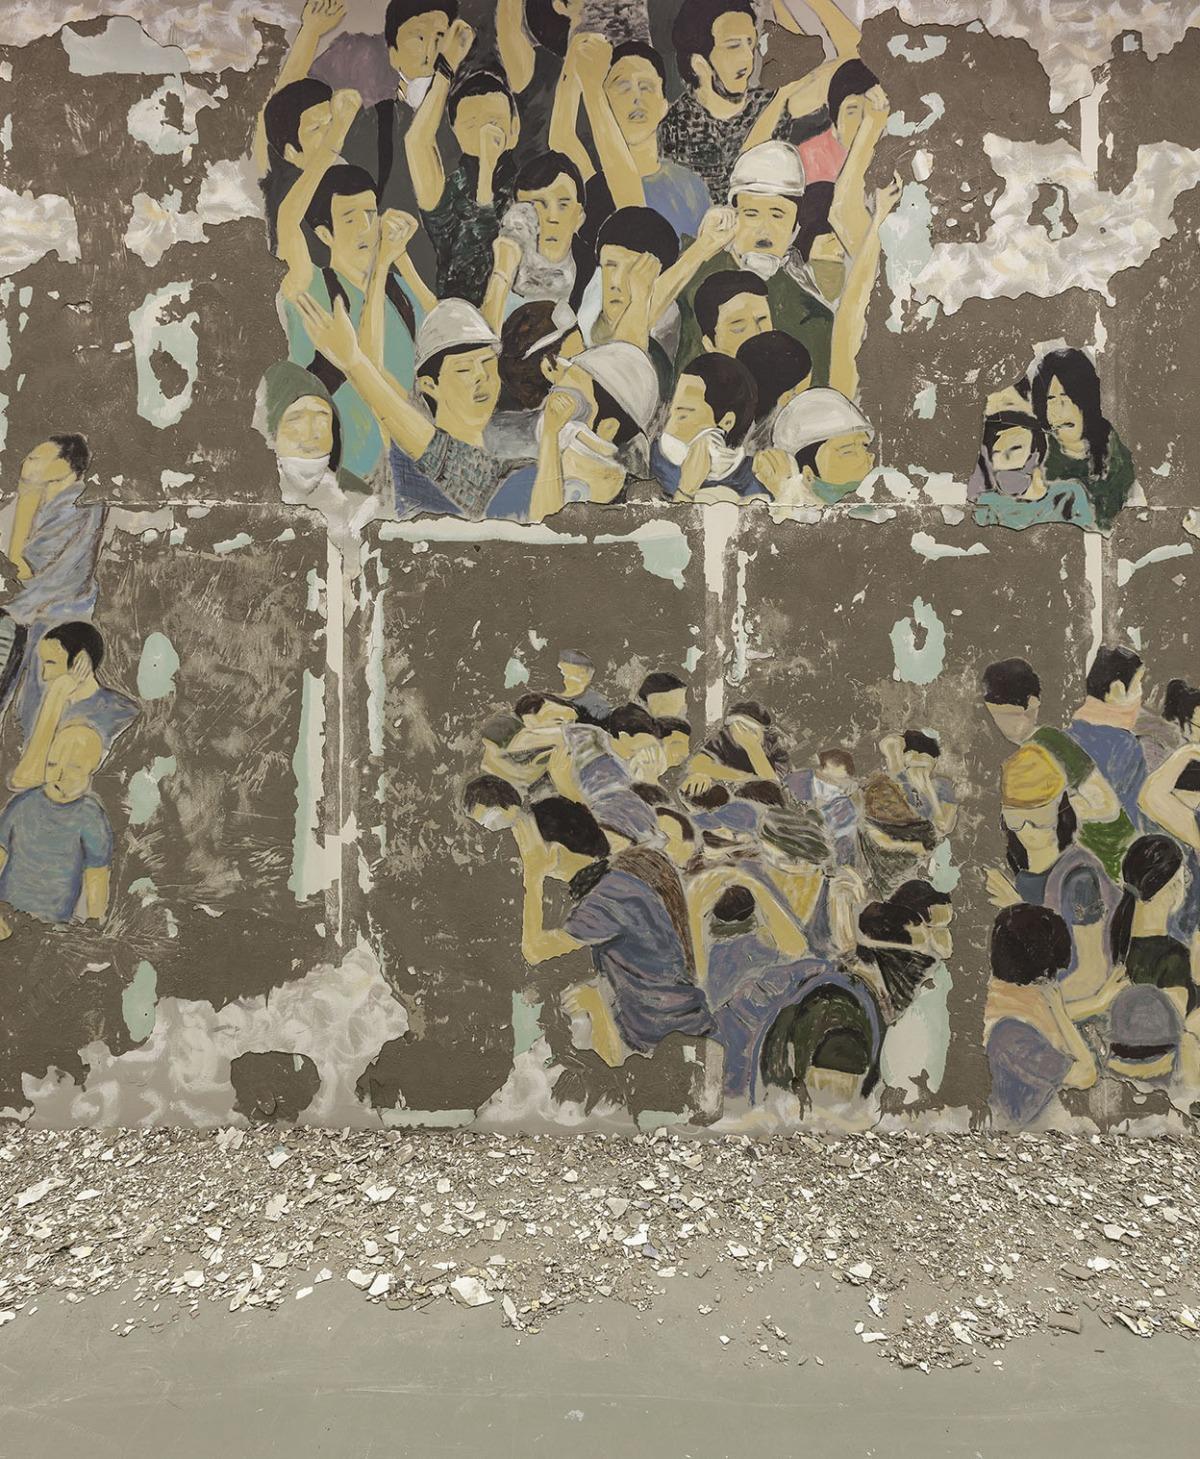 Latifa Echakhch, Crowd Fade, 2017  Fresco 365 x 2028 x 136 cm each  Courtesy of the artist, Galerie Kamel Mennour (Paris), Kaufmann Repetto (Milan), Galerie Eva Presenhuber (Zurich), Dvir Gallery (Tel Aviv)  Produced with the support of Pro Helvetia and I